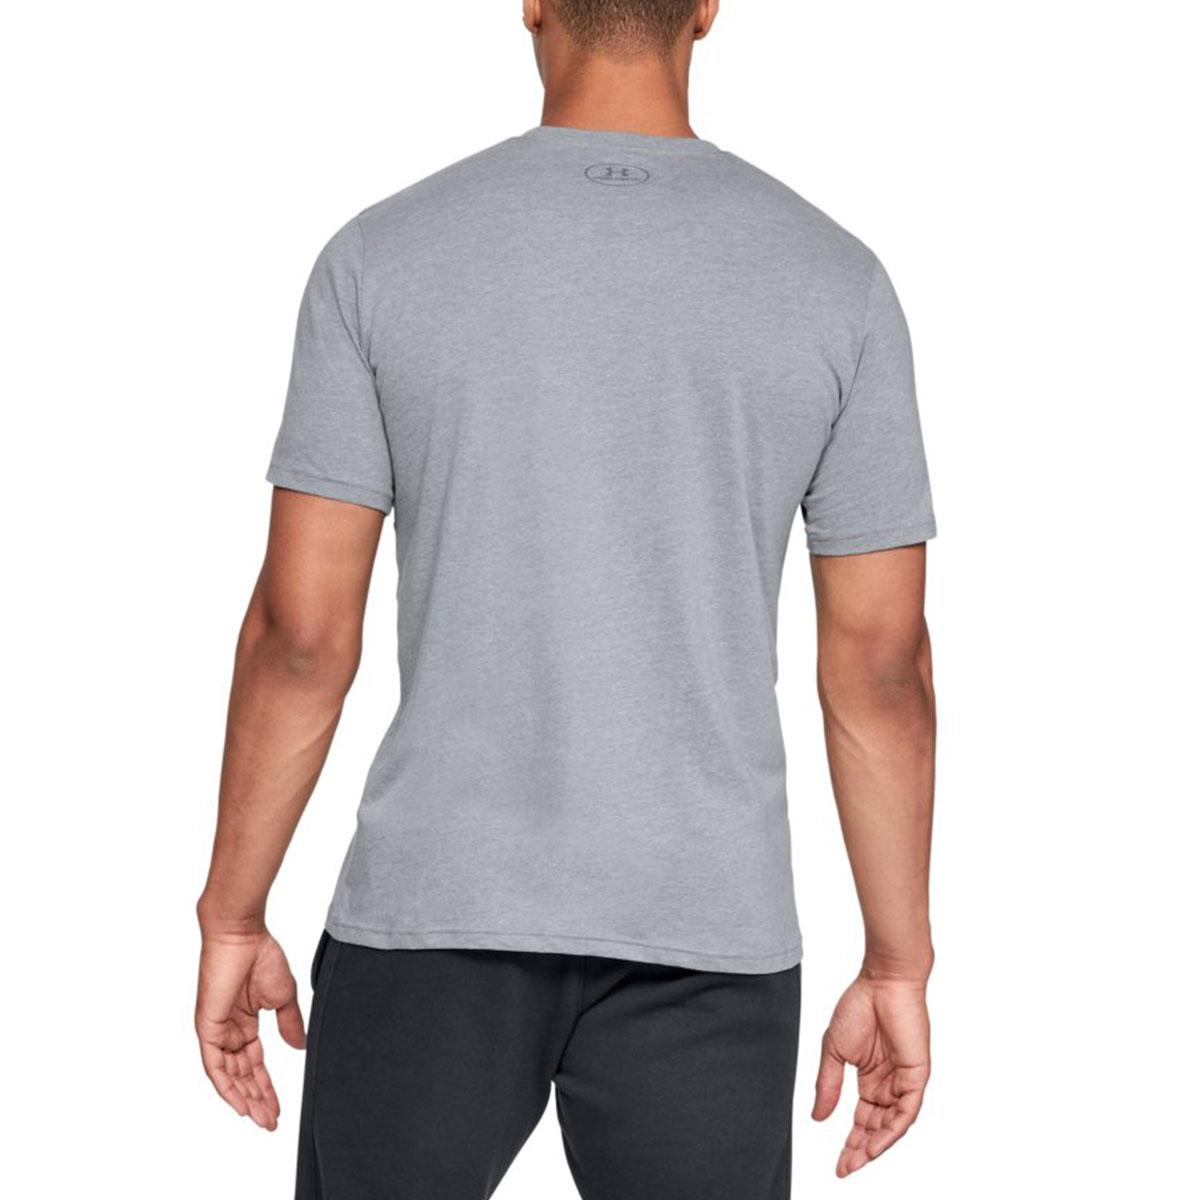 Under-Armour-Mens-2019-UA-Boxed-Sportstyle-HeatGear-Training-Gym-T-Shirt-Tee thumbnail 19